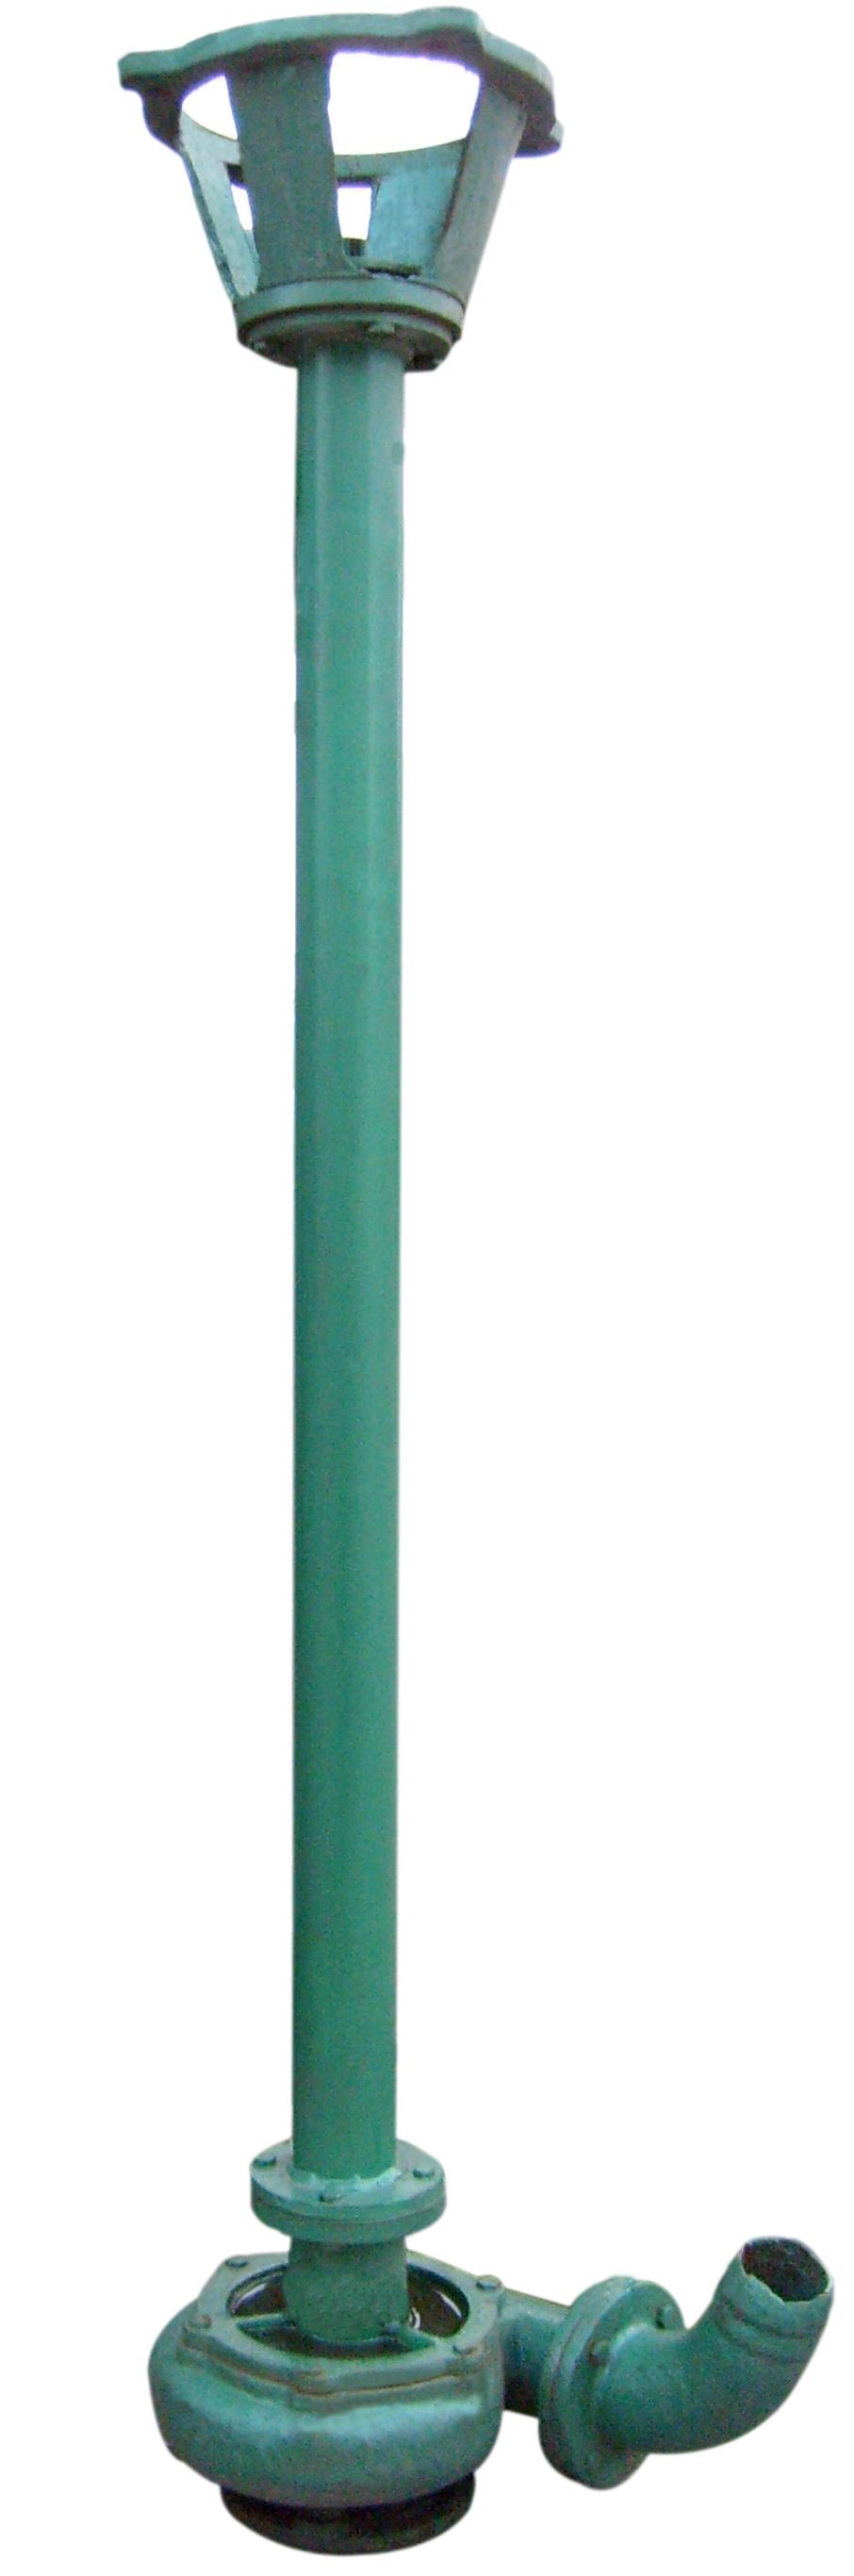 NL(NWL)泥浆泵